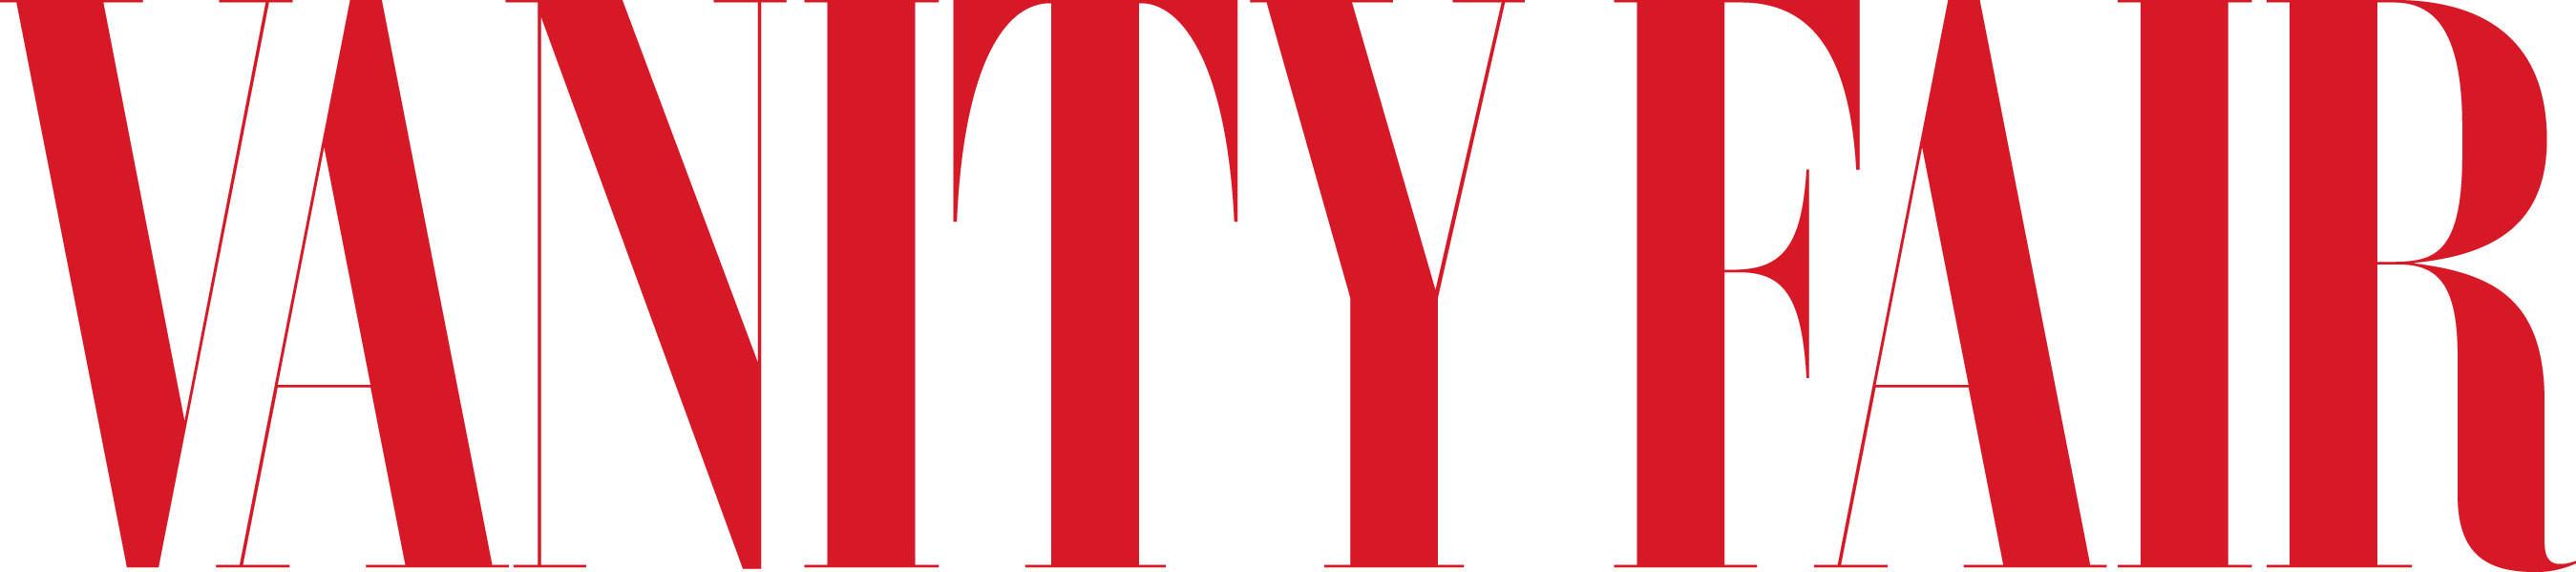 Vanity fair Logos.